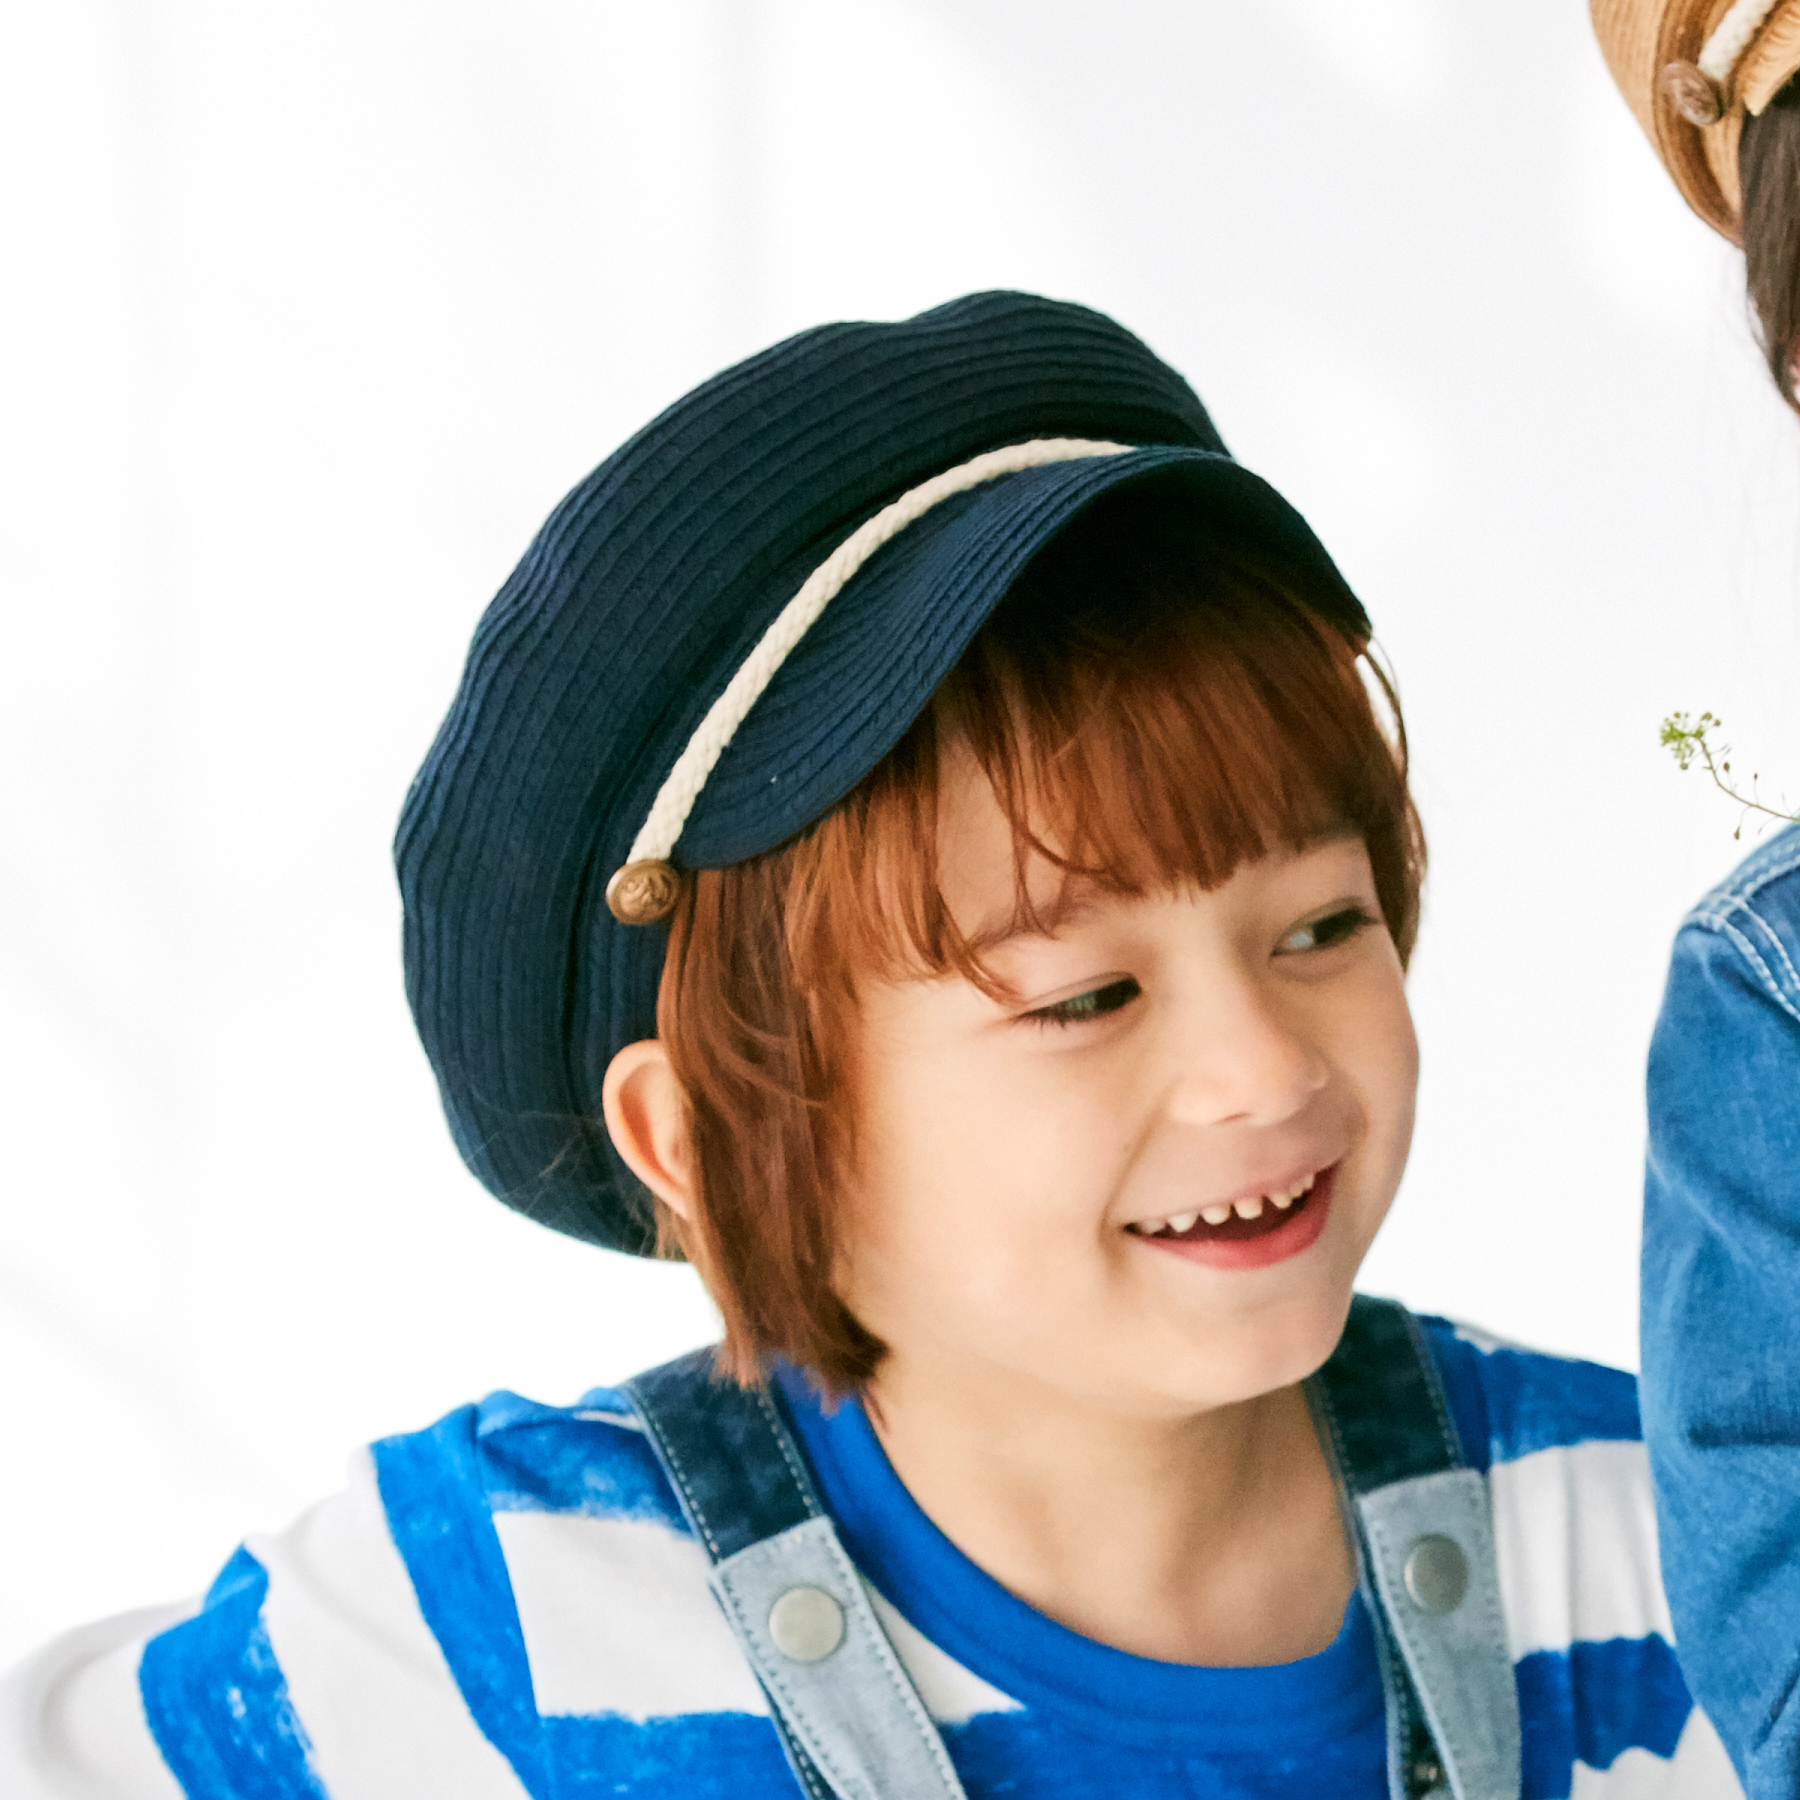 【HusHusH(Kids) (ハッシュアッシュ)】ブレードマリンキャスケットキッズ 帽子 キャスケット ネイビー